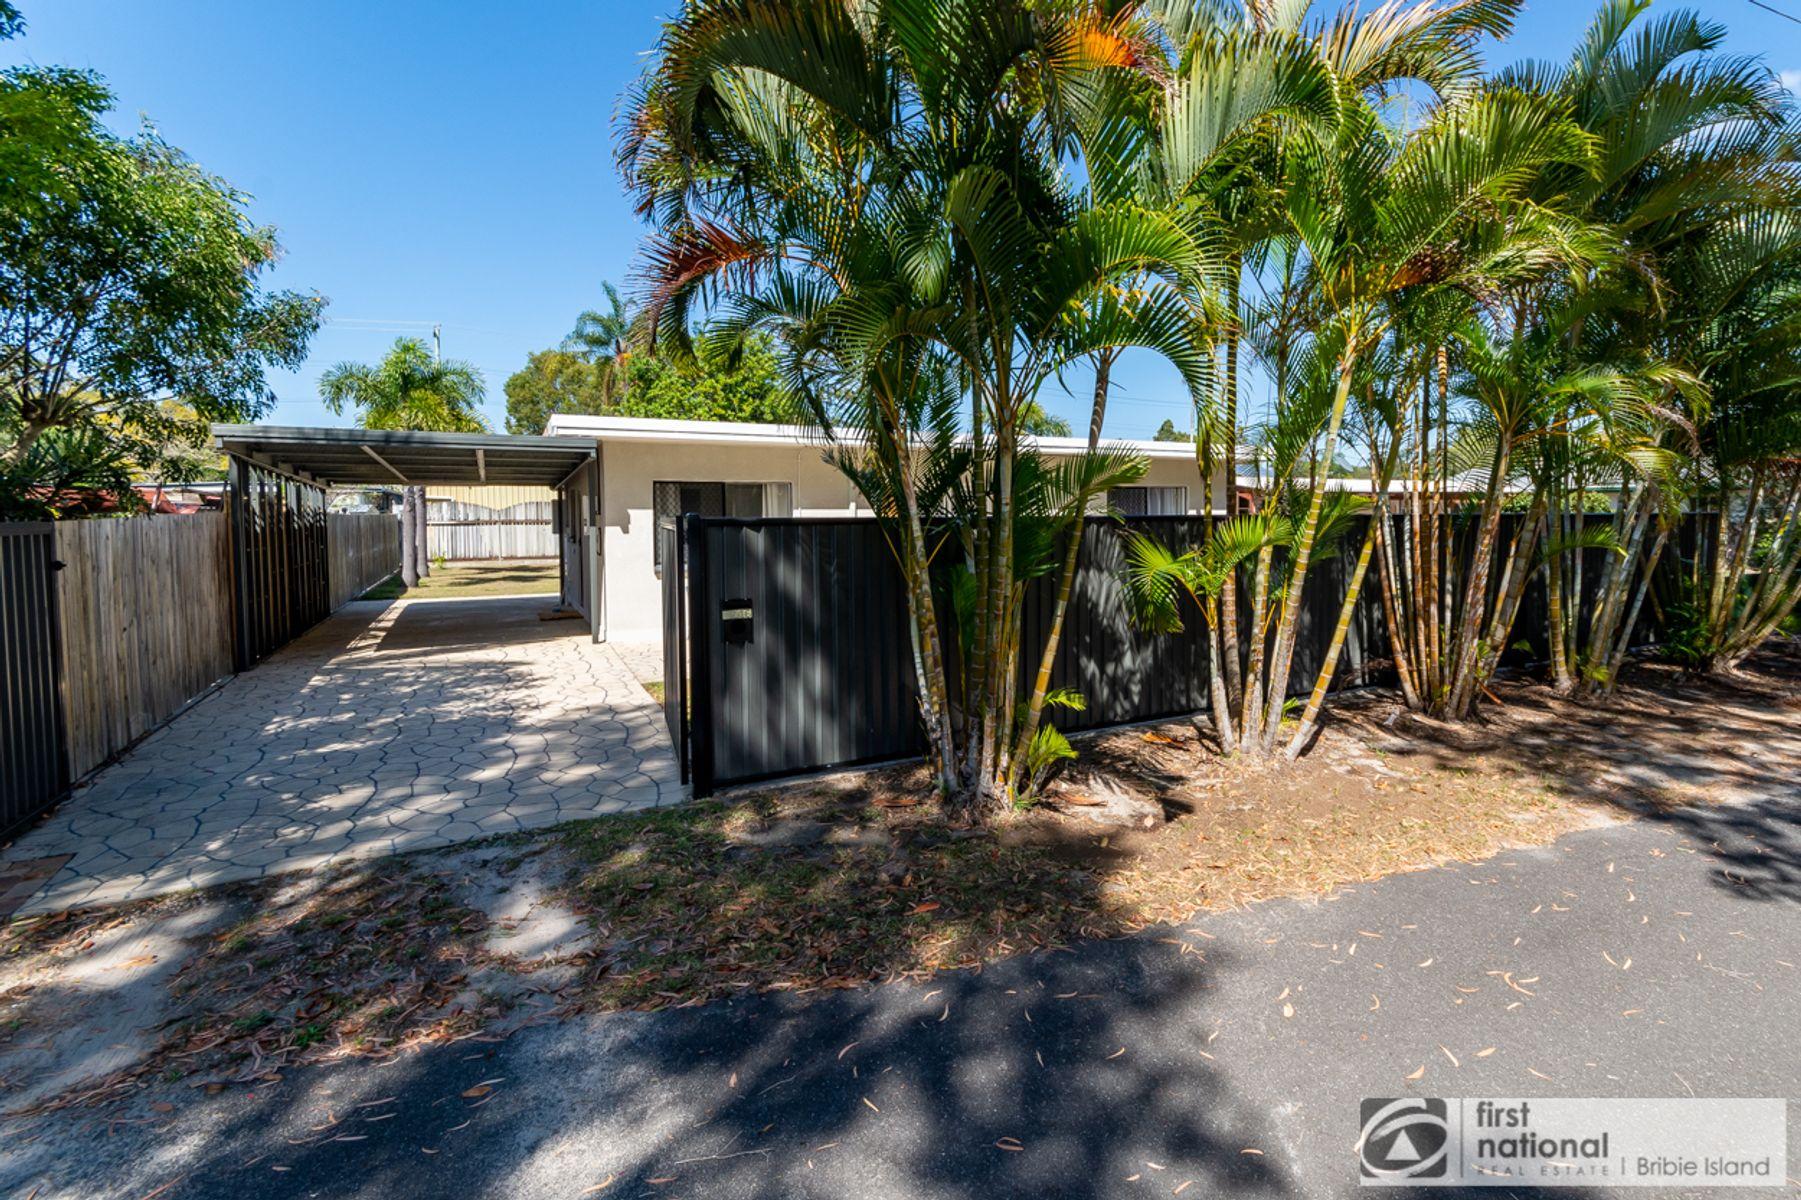 1246 Bribie Island Road, Ningi, QLD 4511